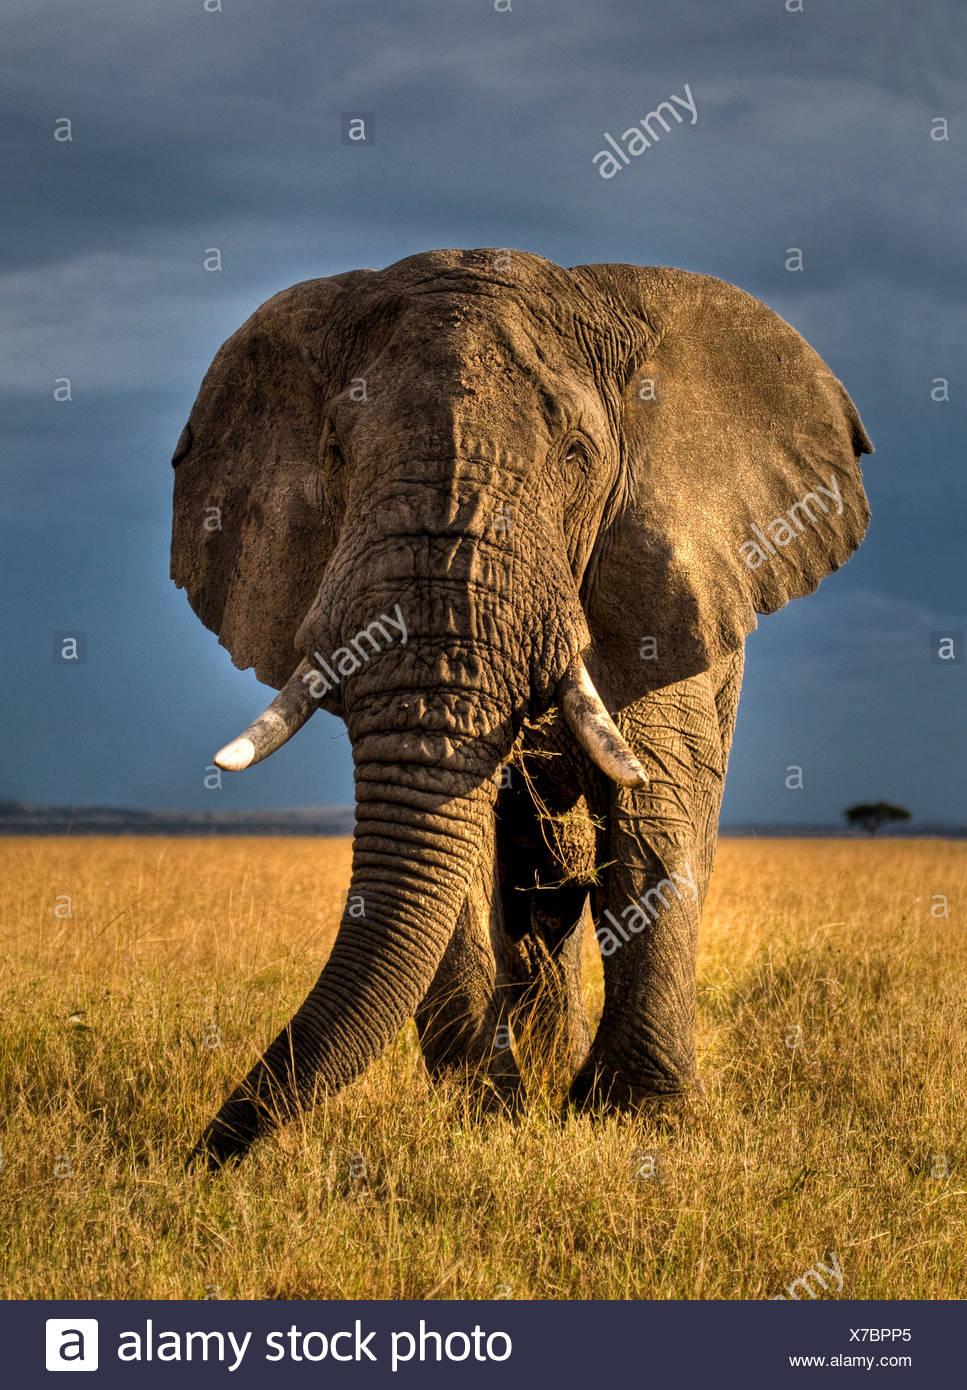 African elephant (Loxodonta africana) bull on savanna, Masai Mara, Kenya  (non-ex) - Stock Image